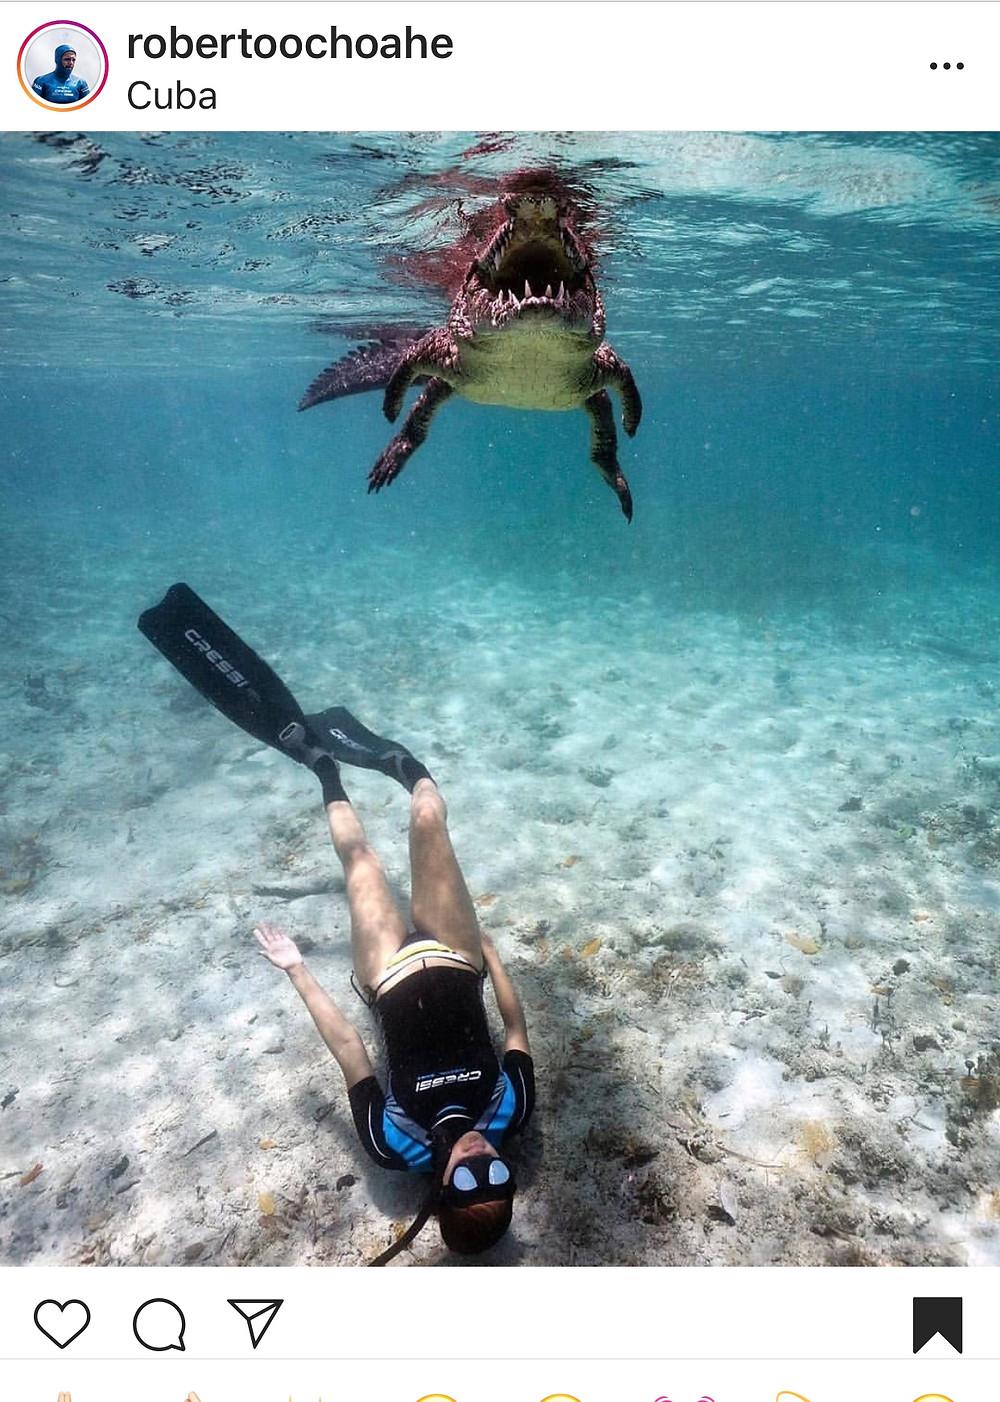 crocodile photograph